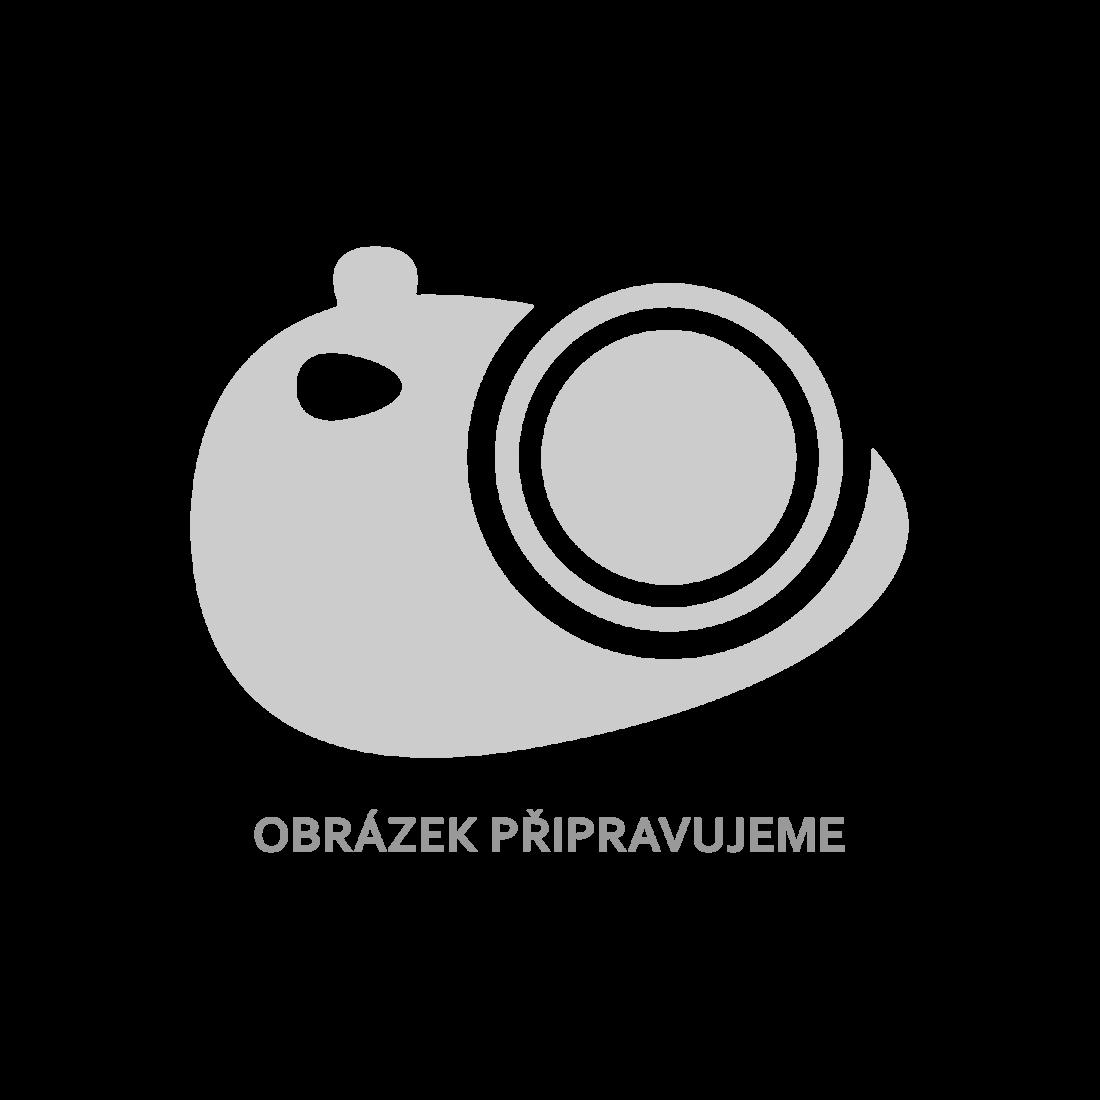 vidaXL Ručně pletený sedací puf modrý 50 x 50 x 30 cm bavlna [287603]